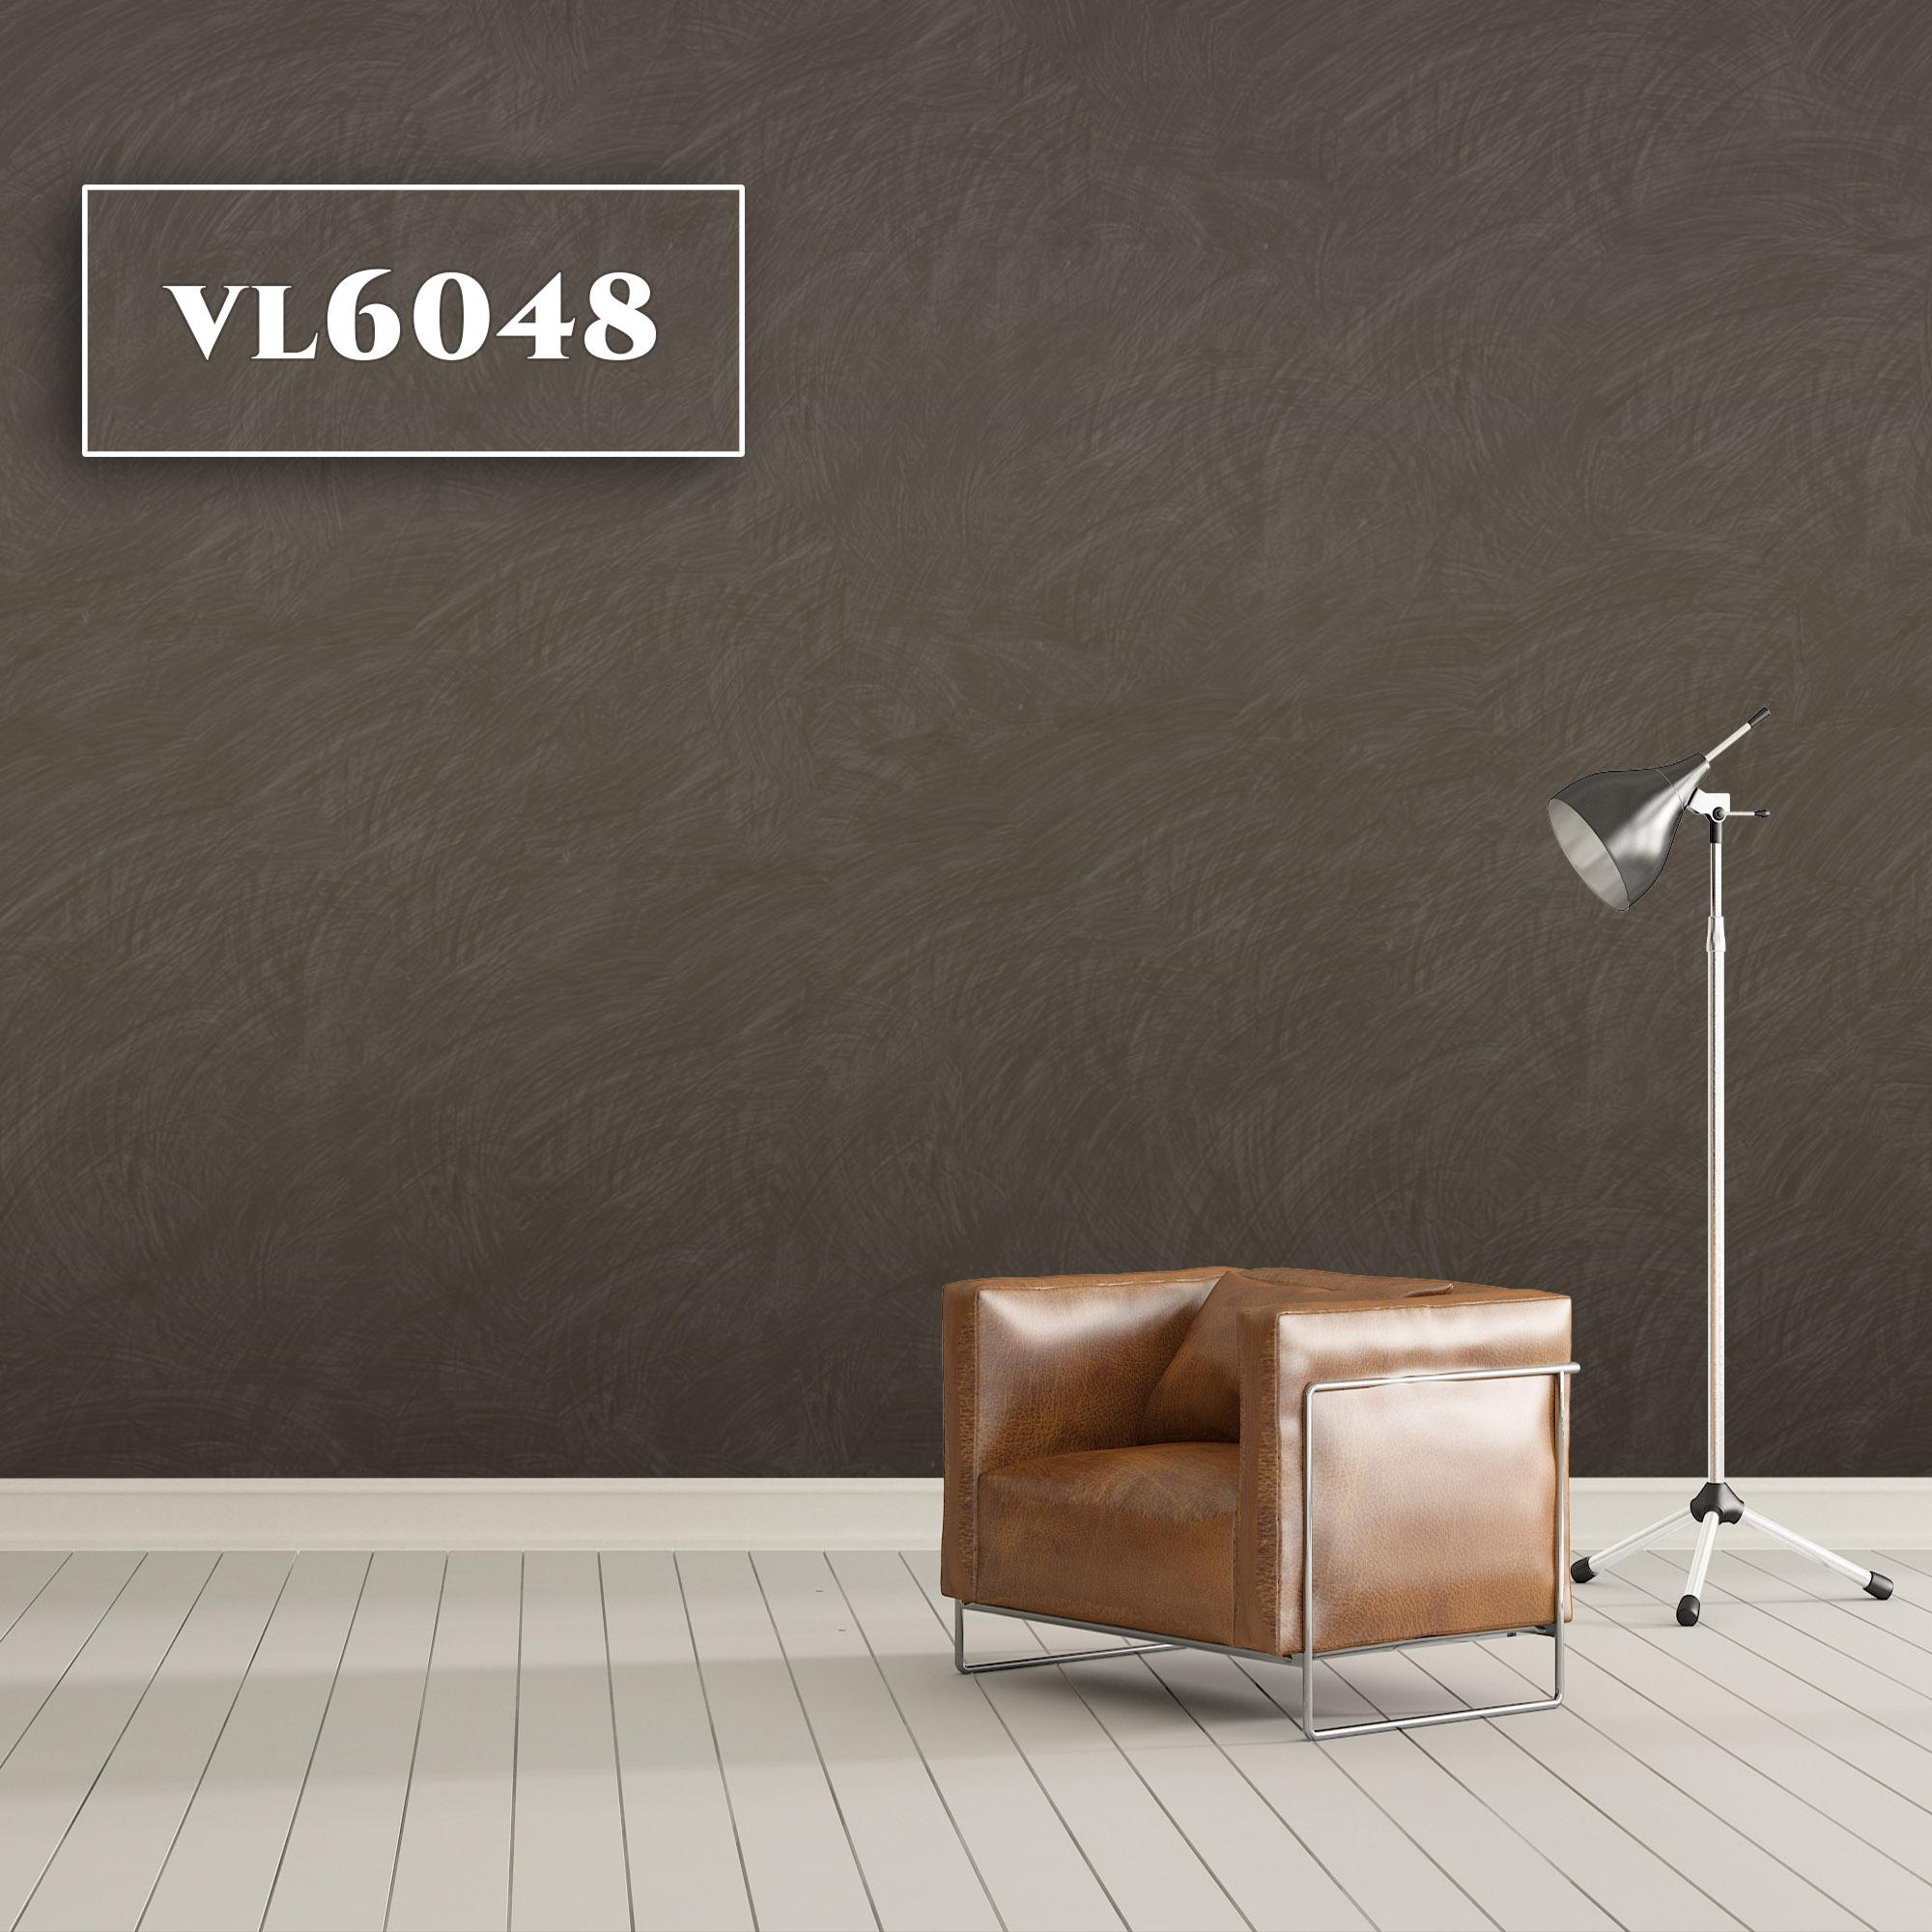 VL6048